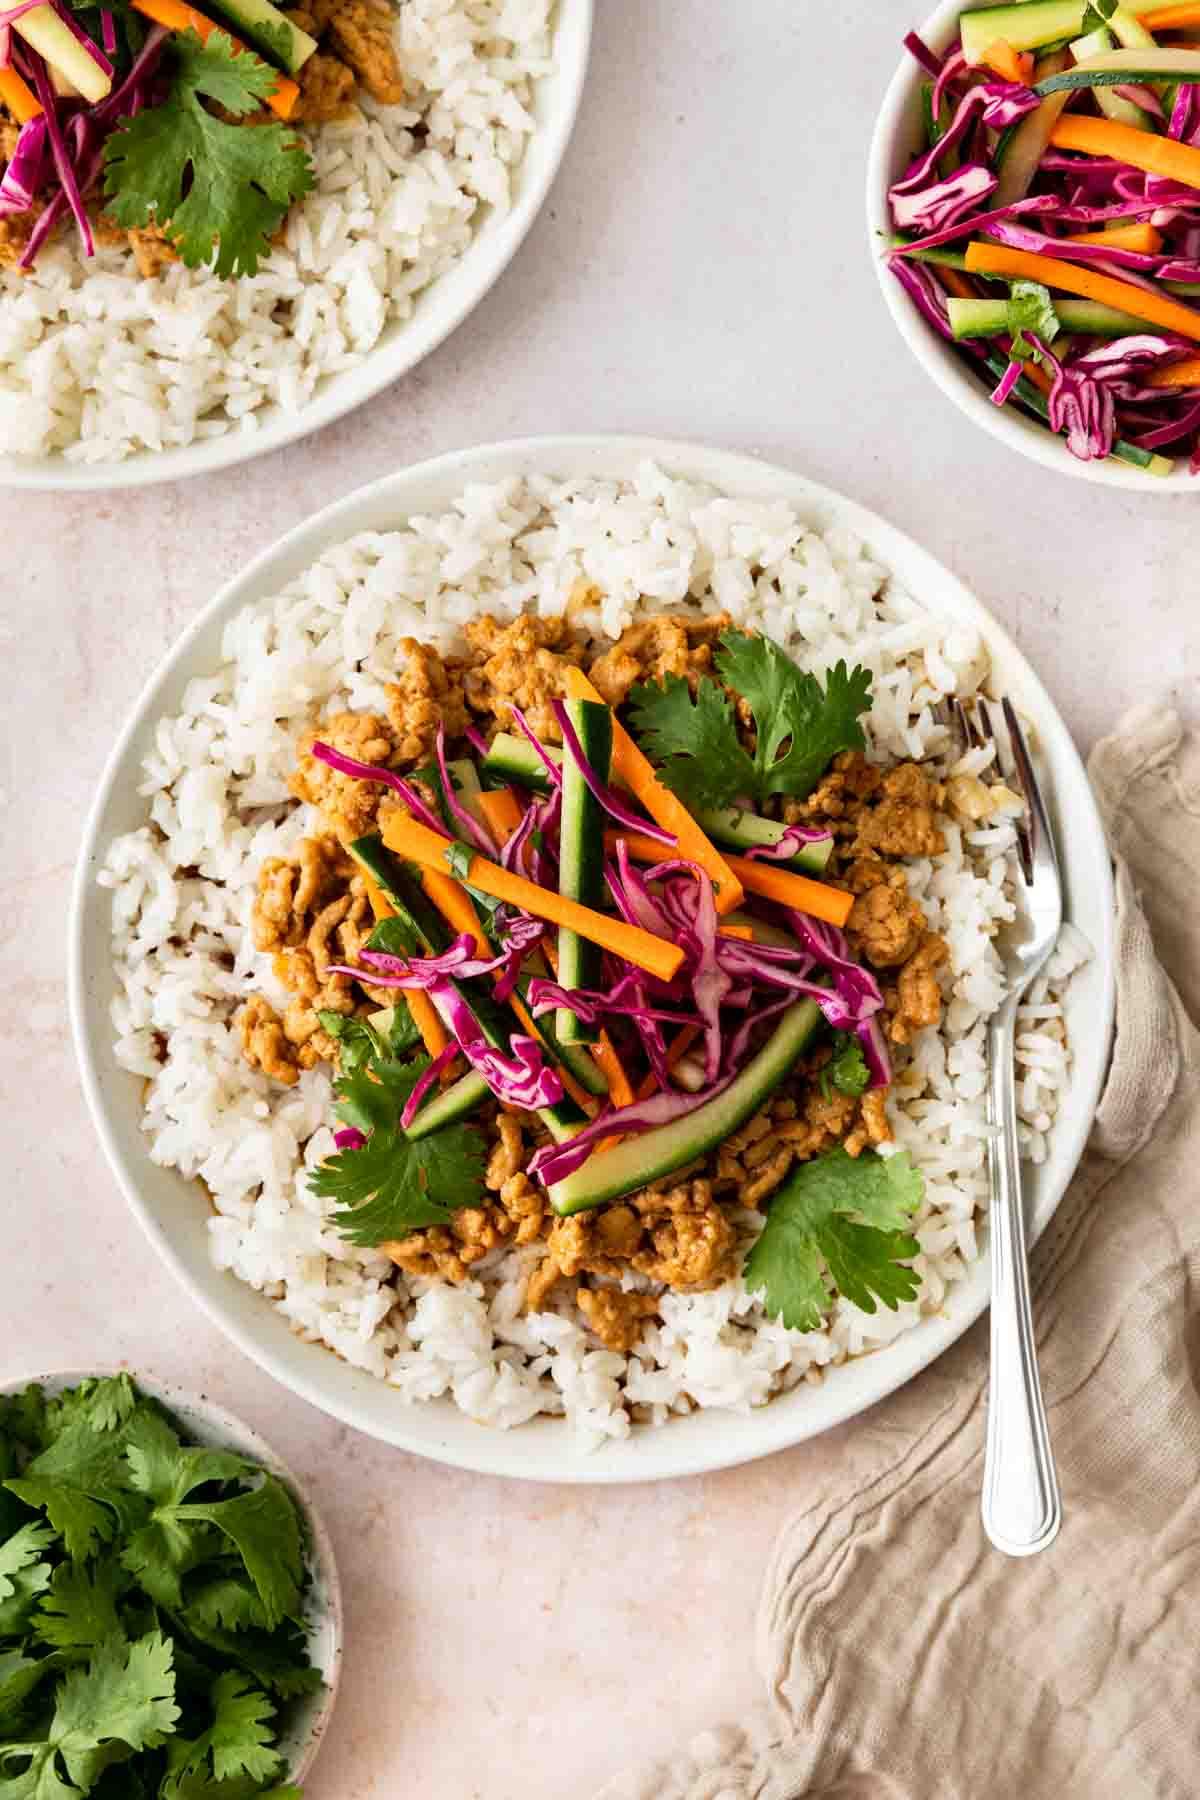 Banh Mi Rice served in bowl